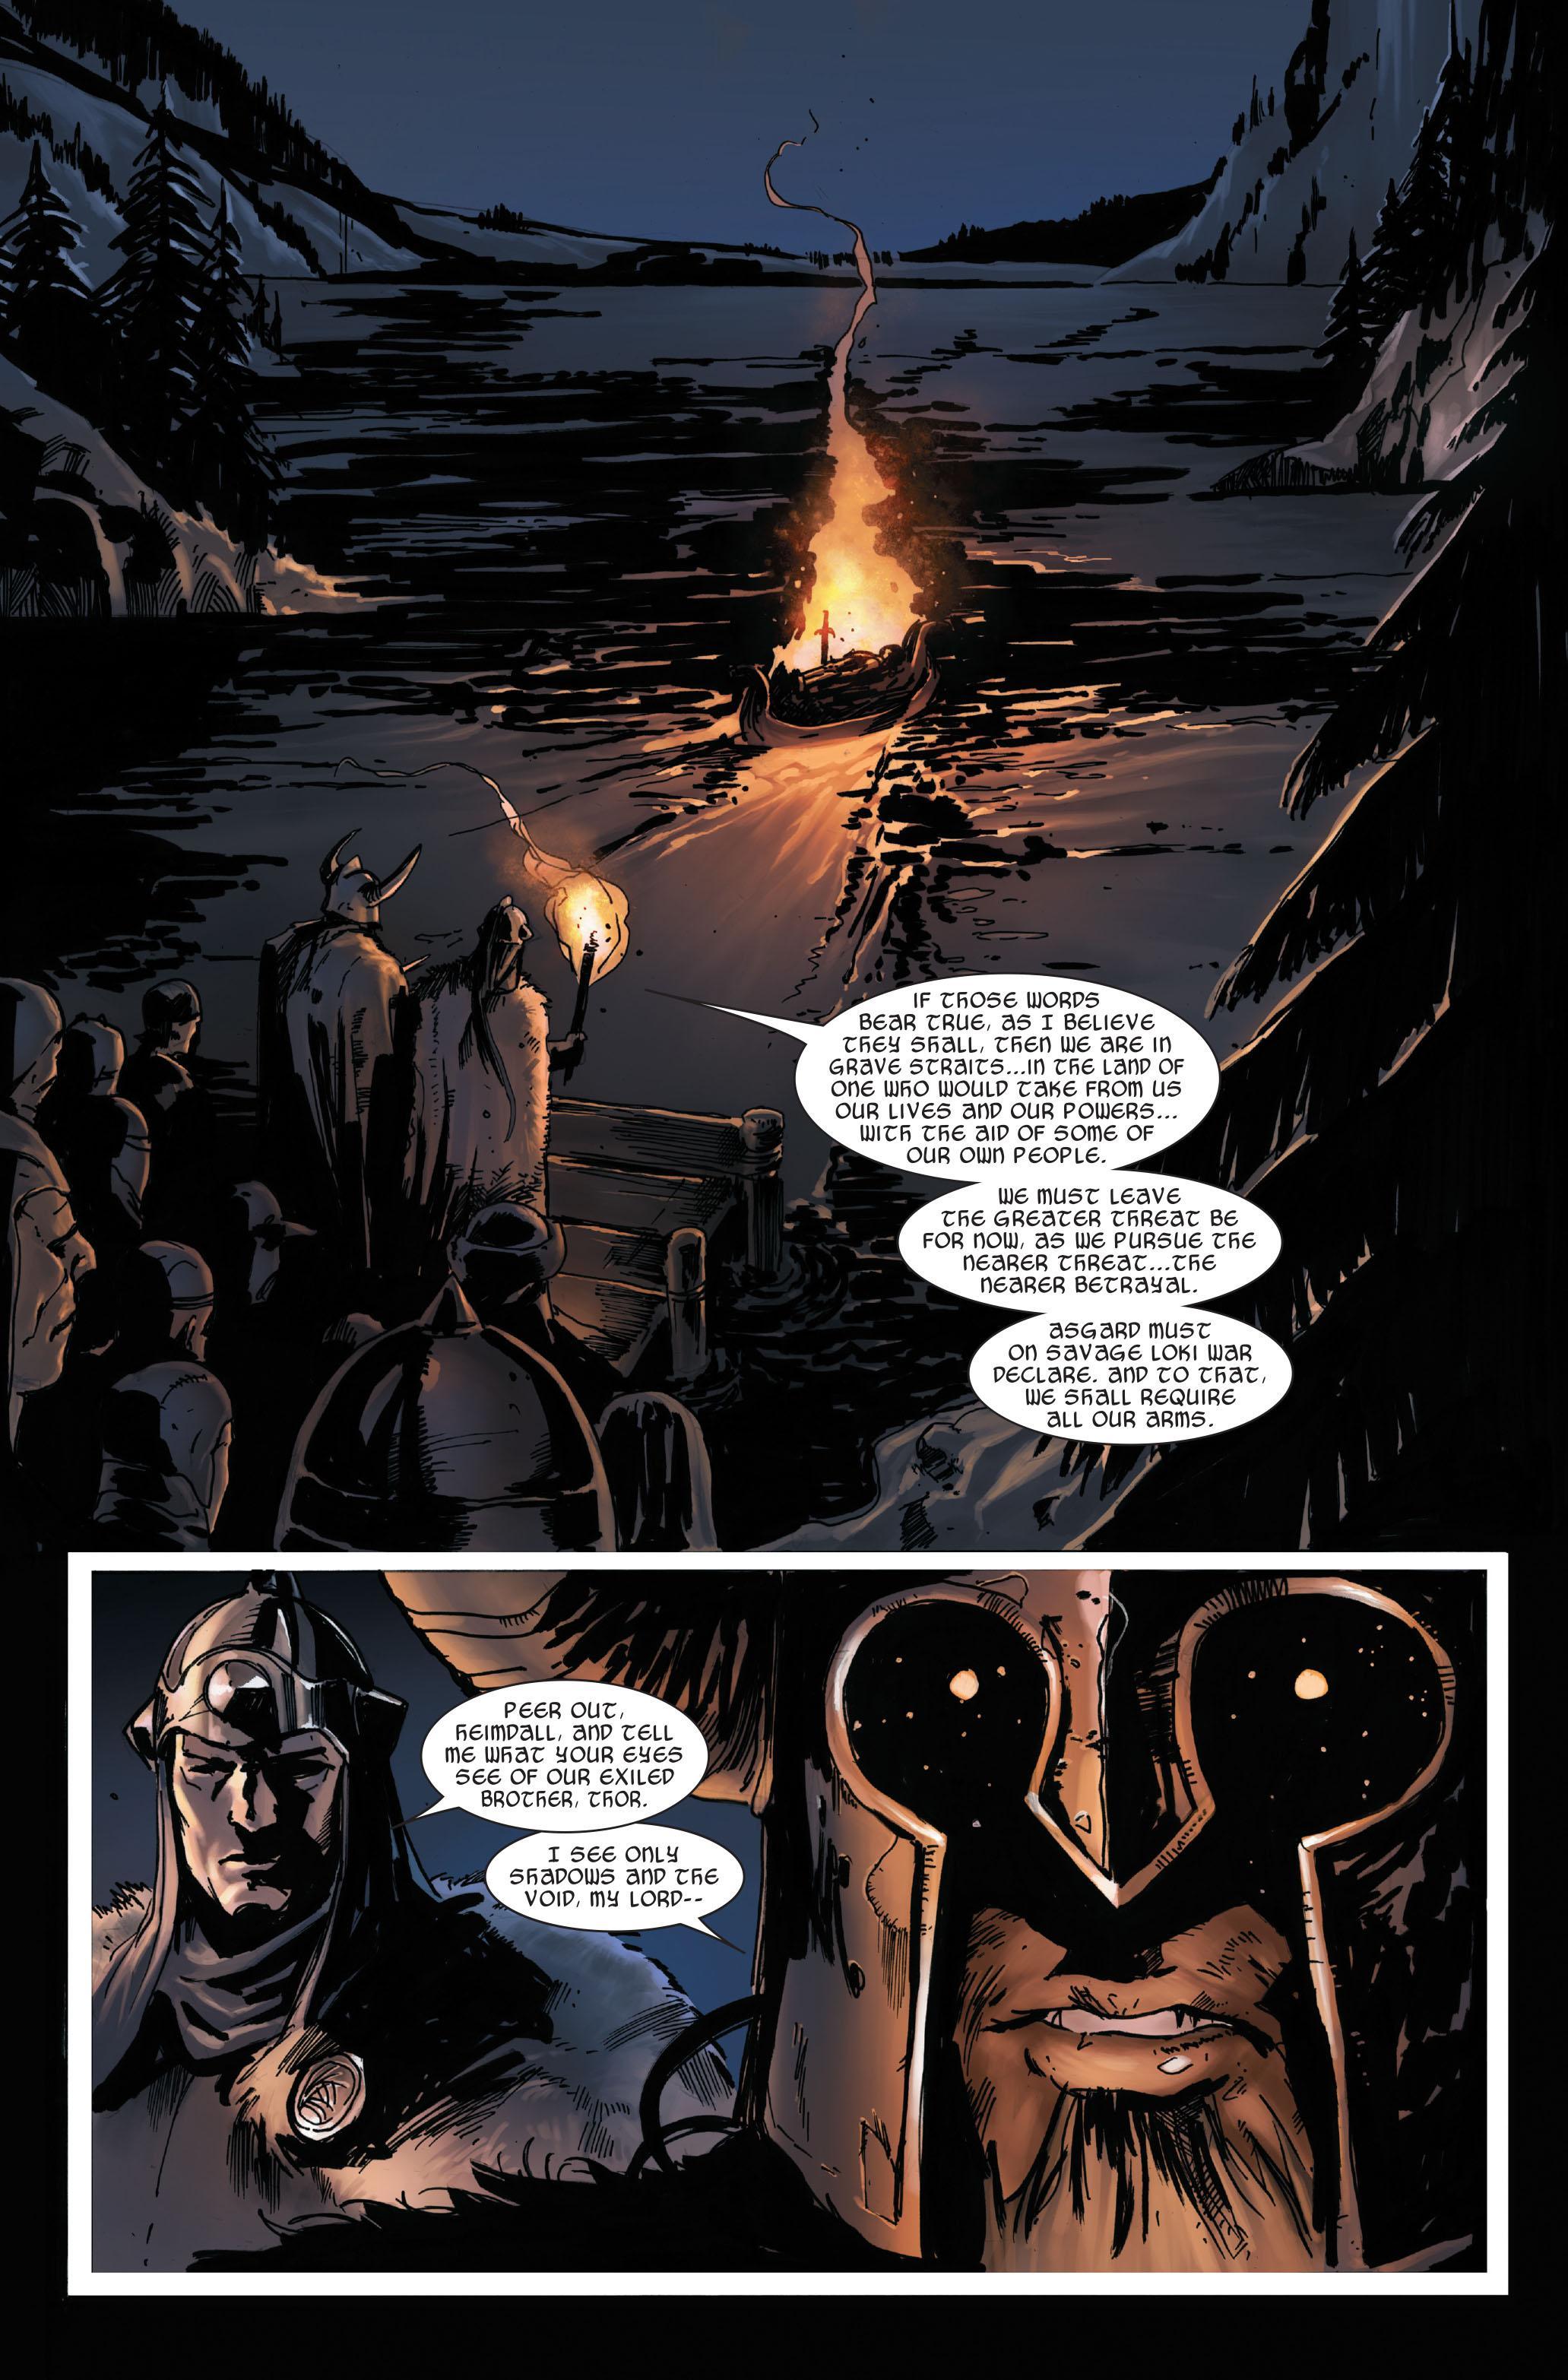 Thor By J. Michael Straczynski Vol. 03 review